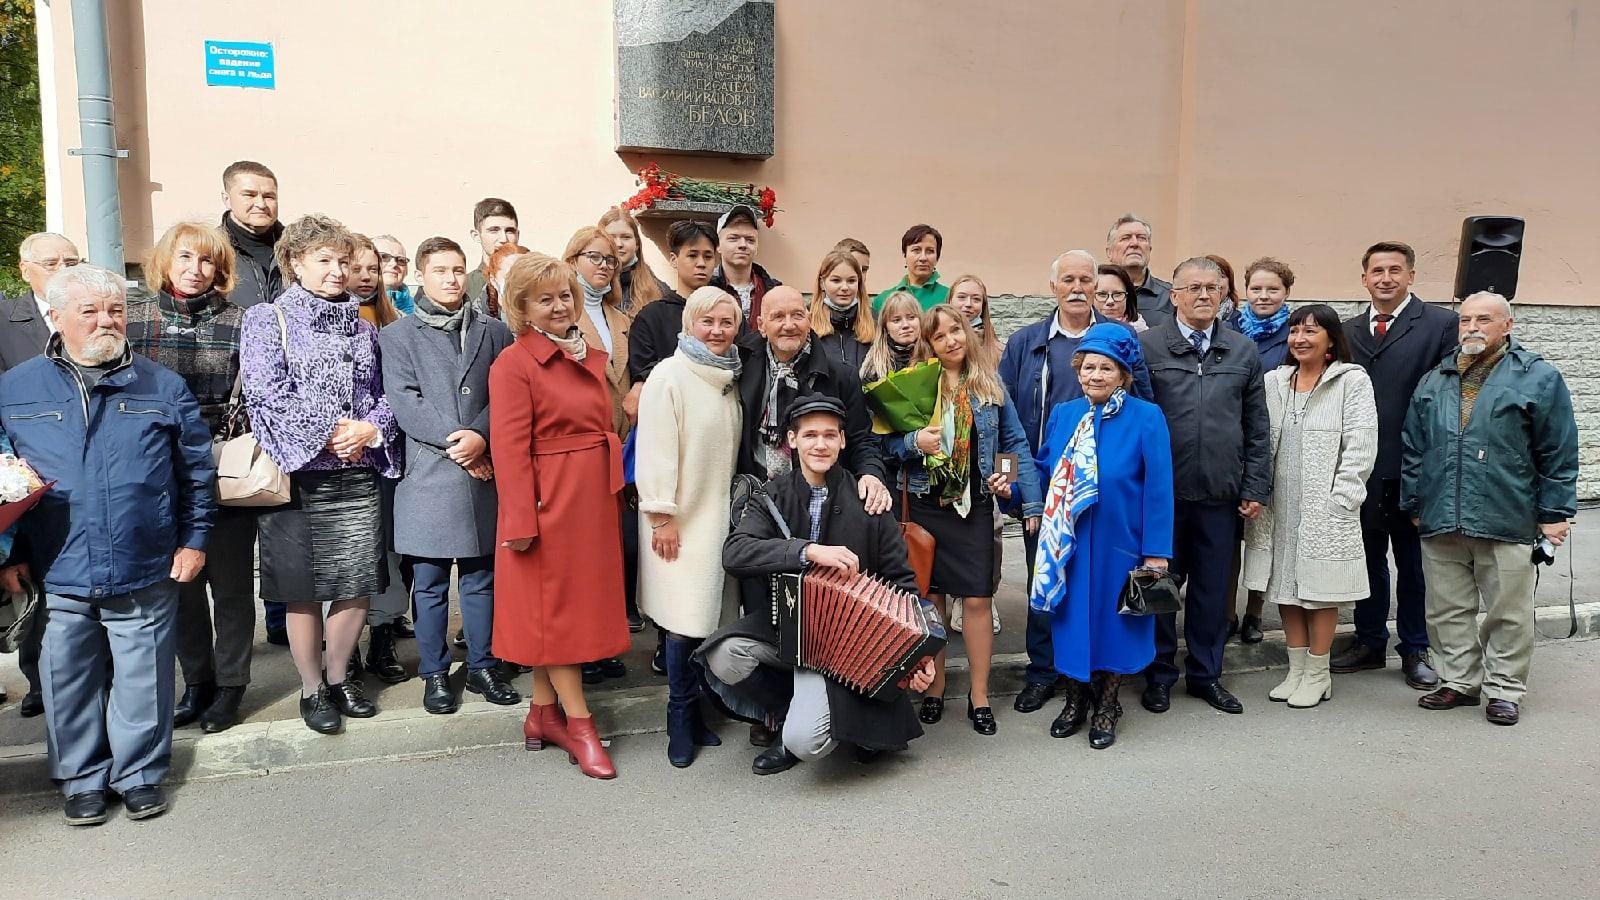 Фото: Центр писателя В.И. Белова